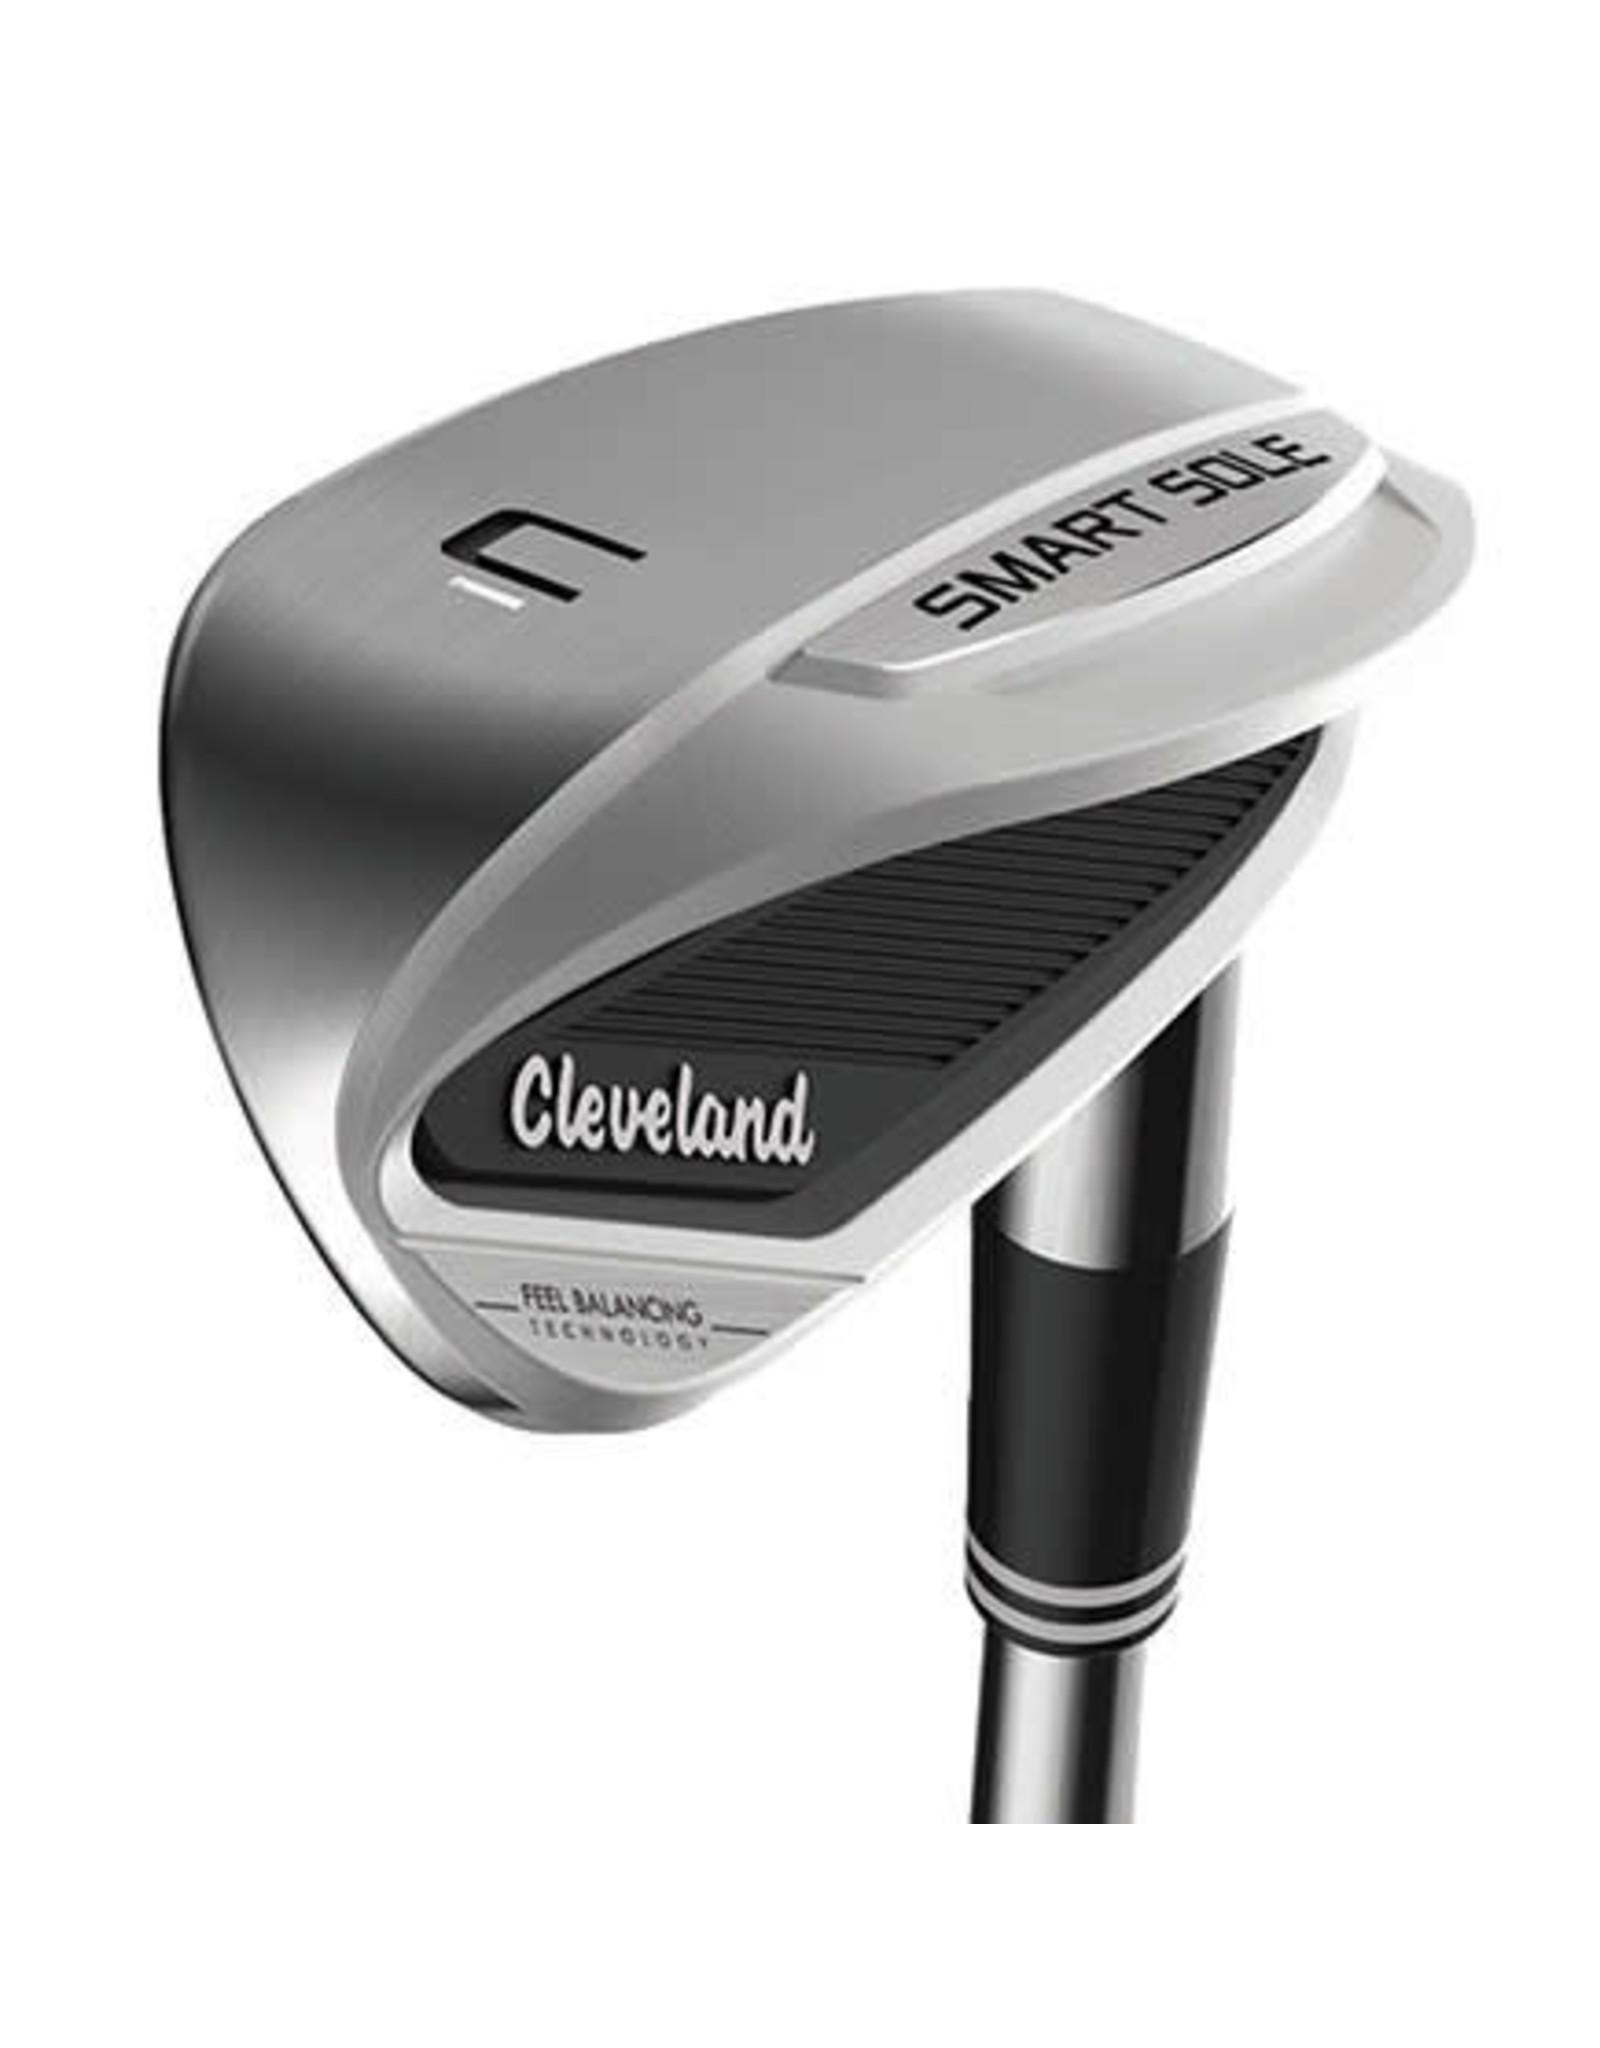 Cleveland Cleveland Smart Sole 3C Wedge